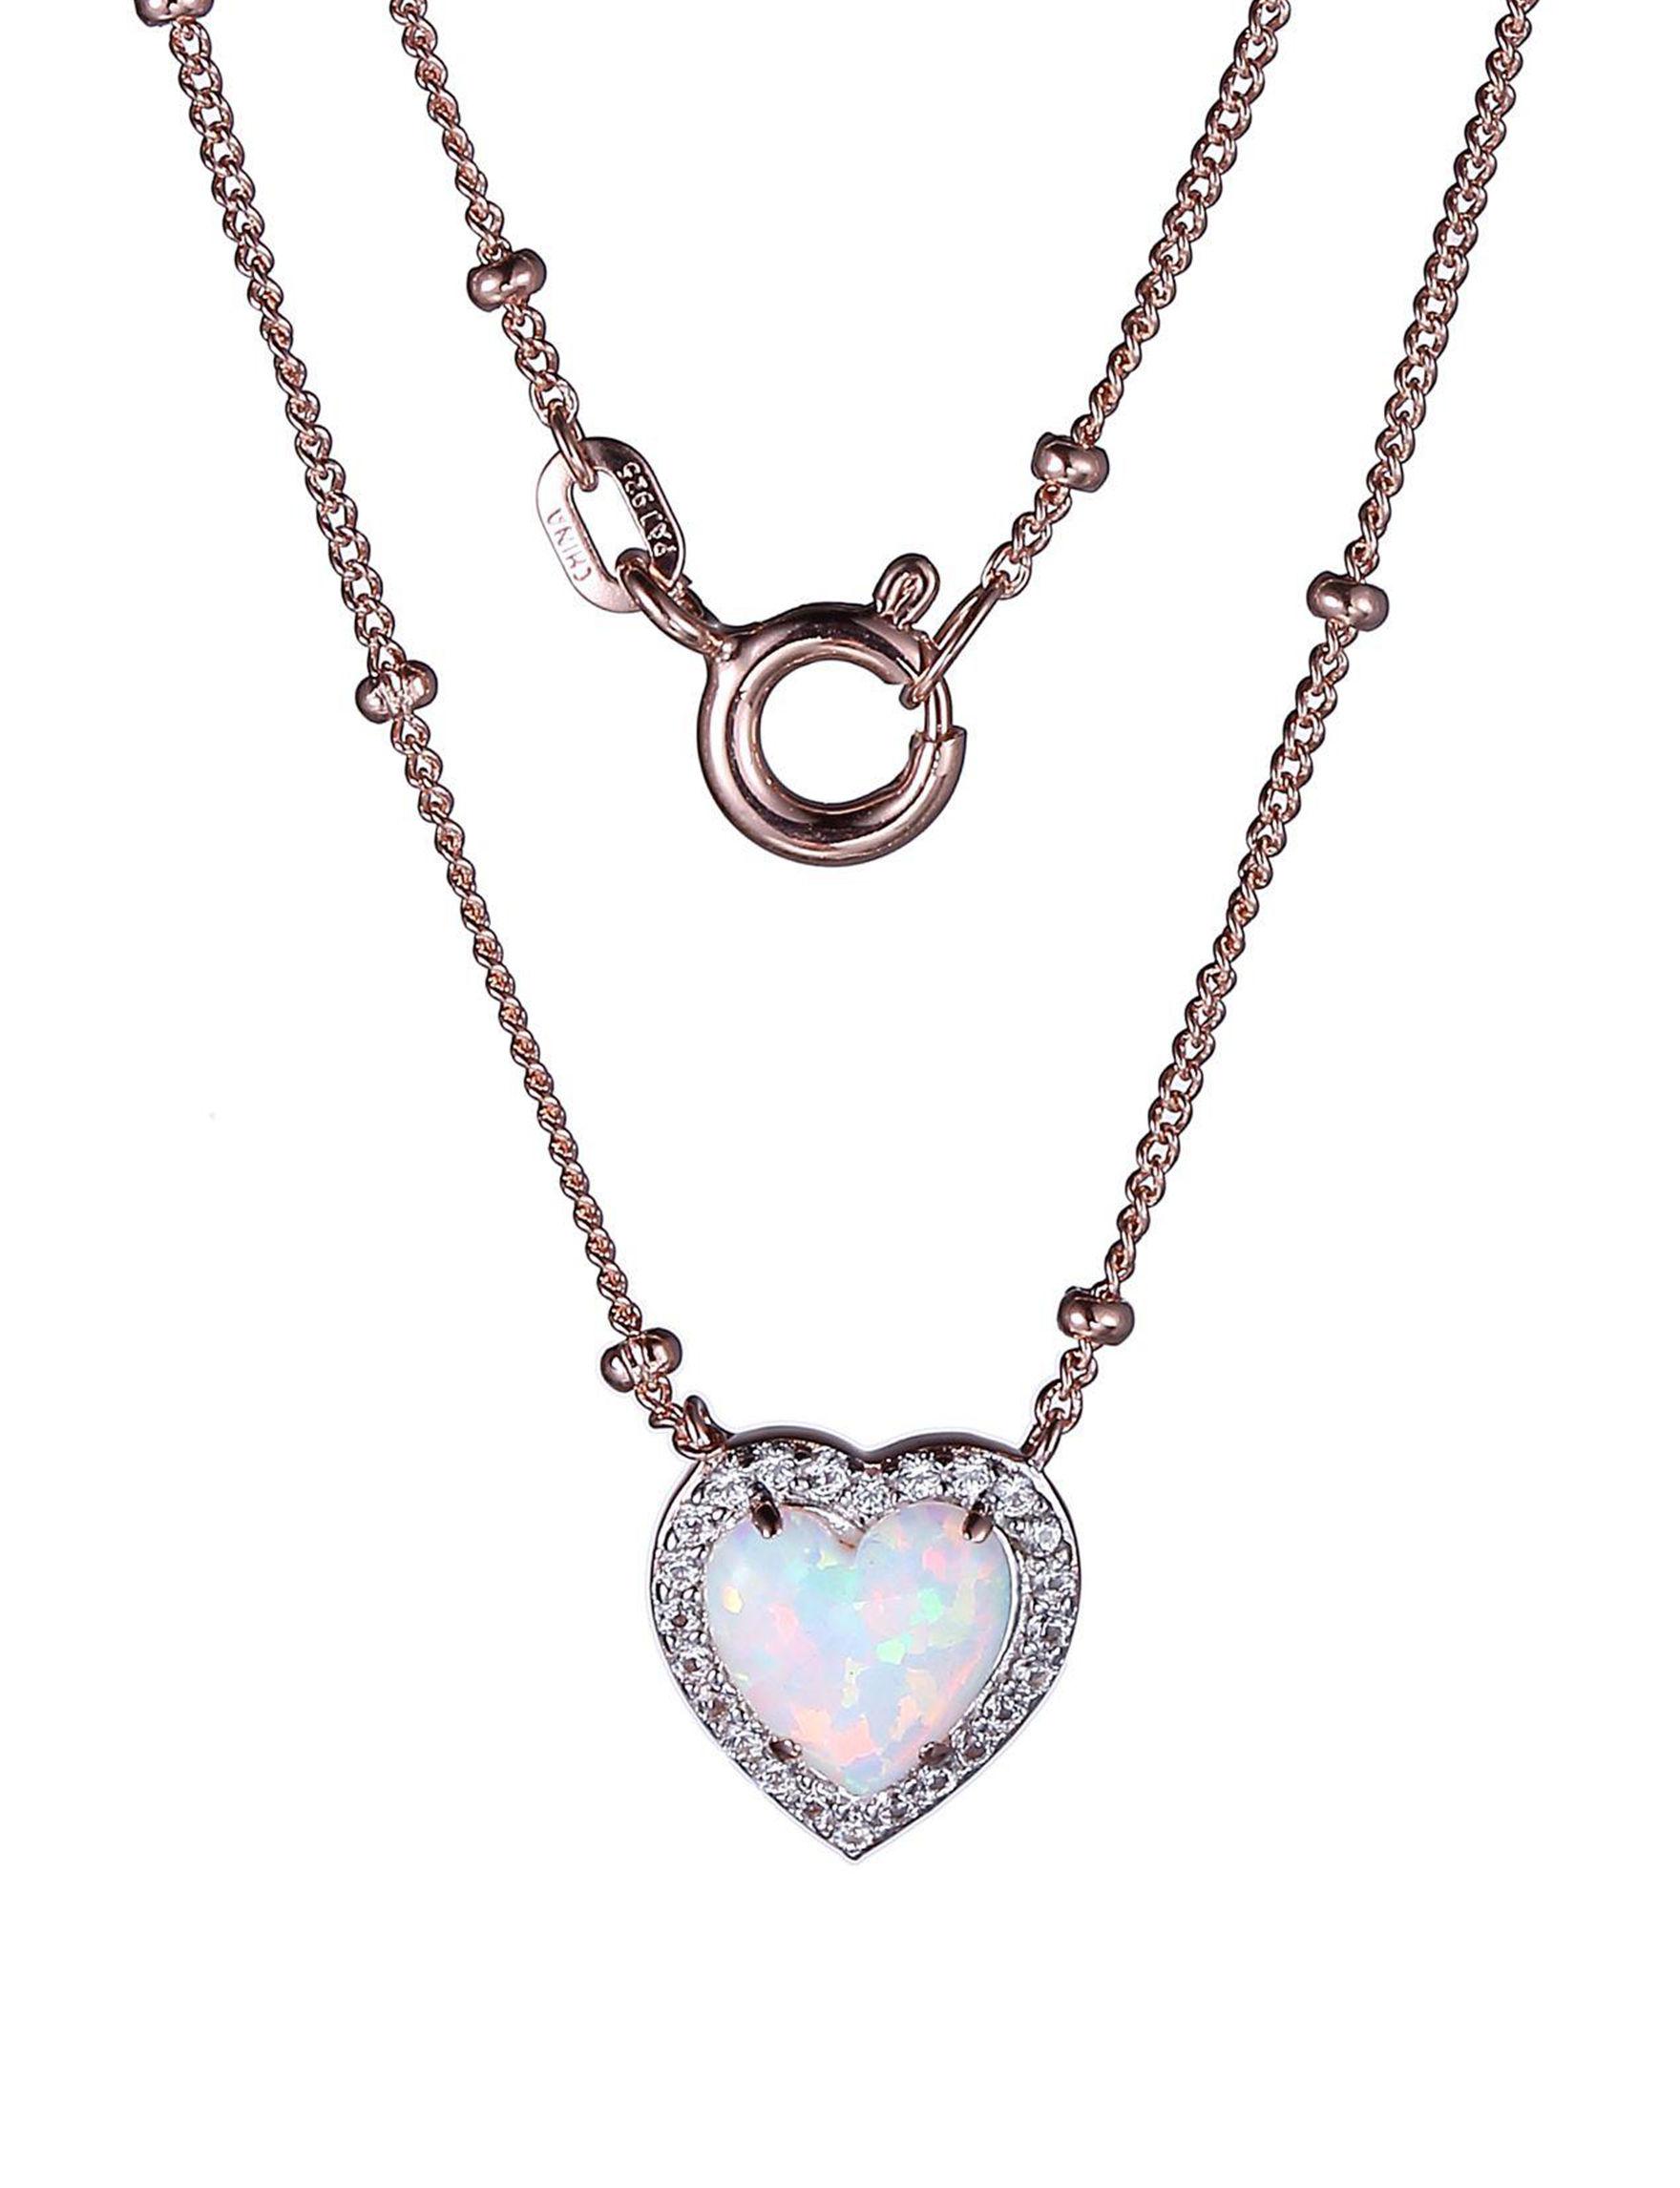 PAJ INC. Opal Necklaces & Pendants Fine Jewelry